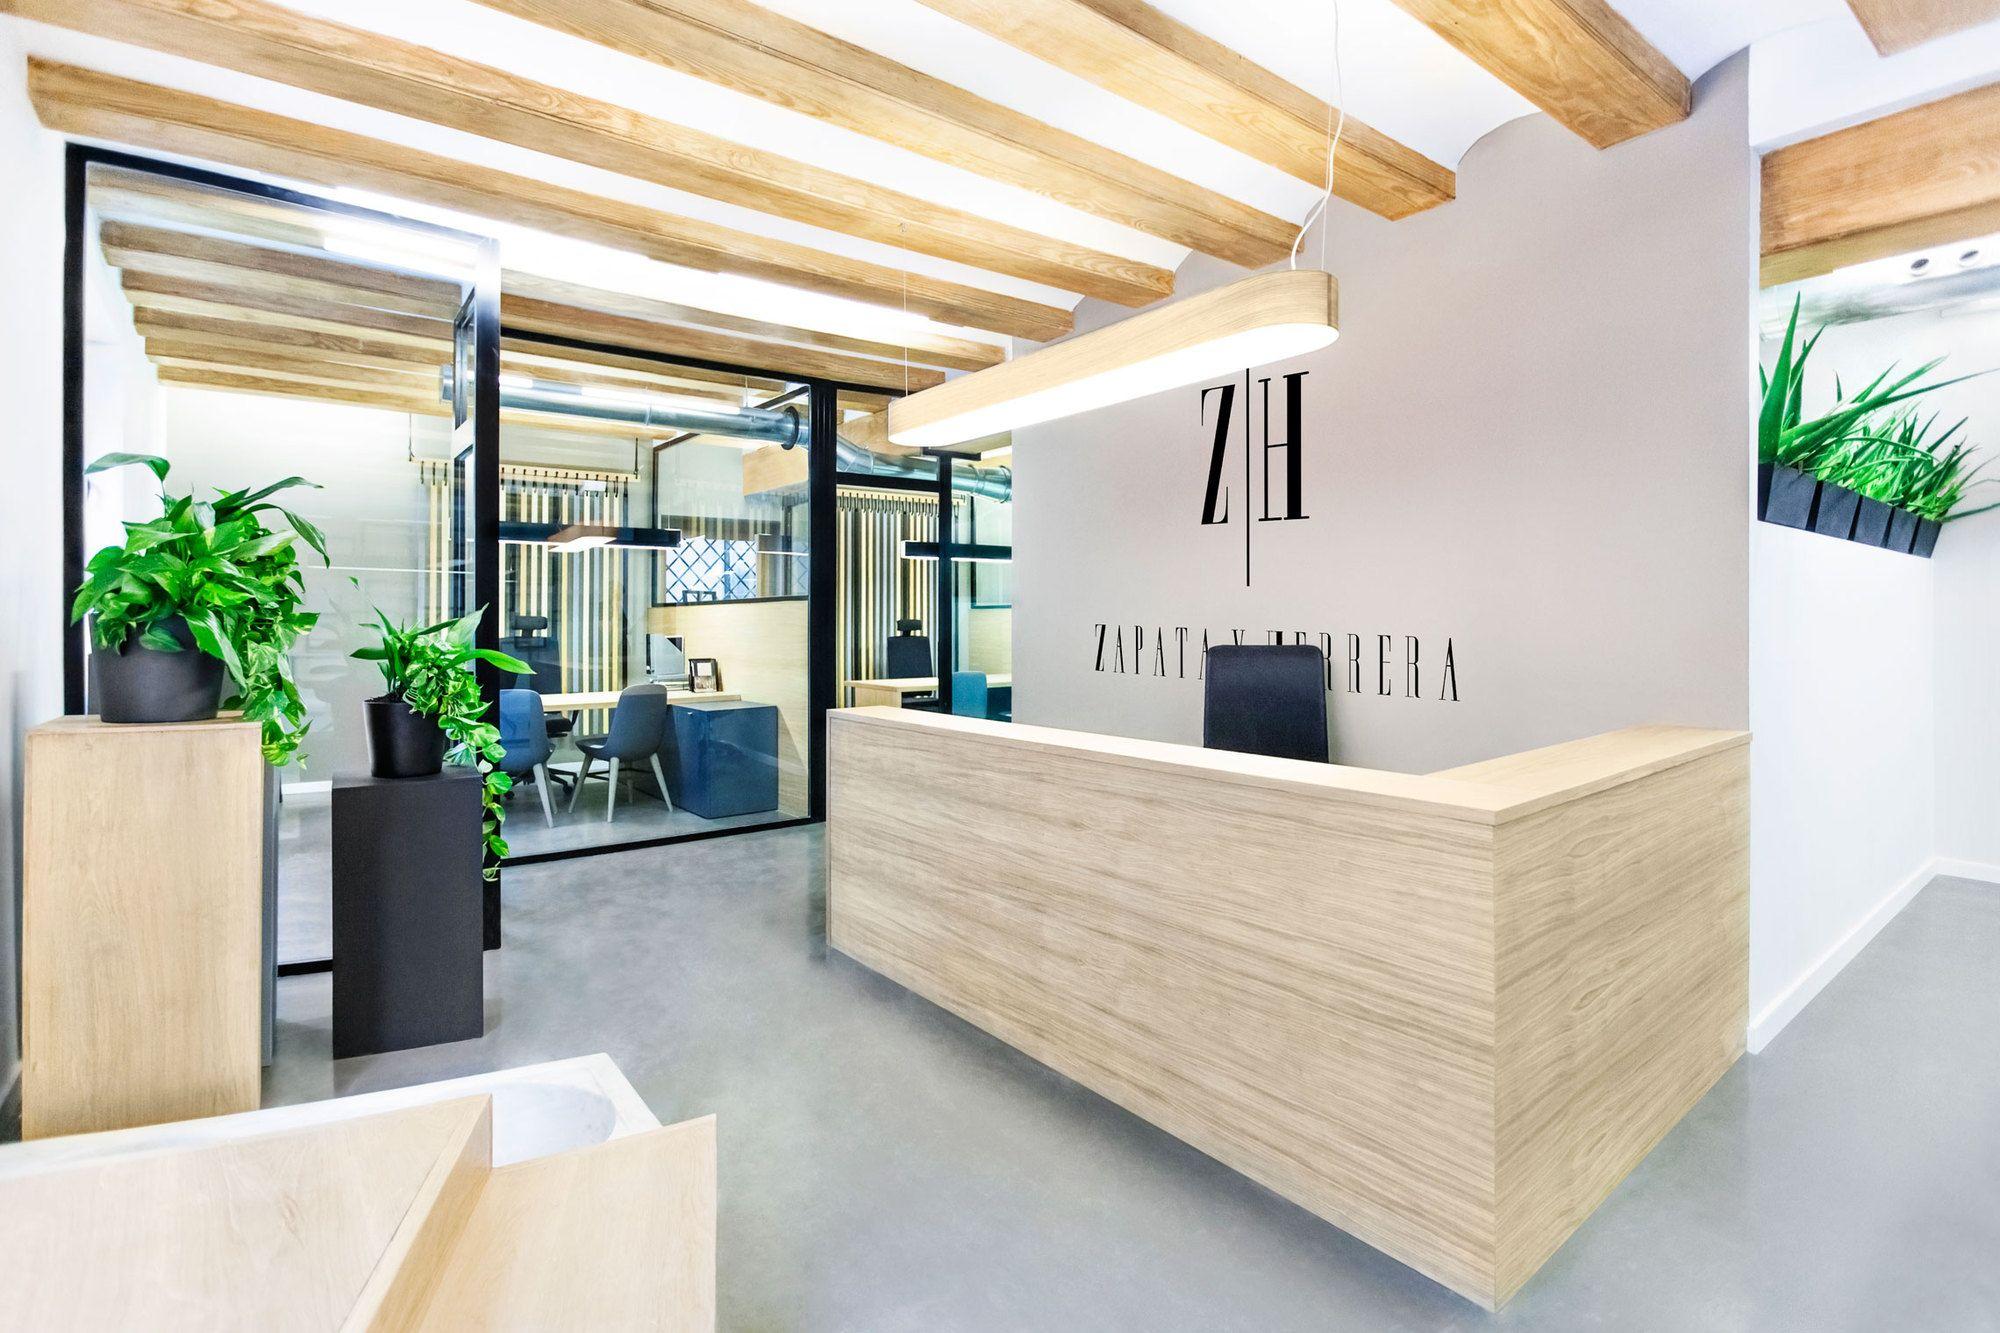 Zapata y Herrera lawyers' office | designed by Masquespacio | www.pinterest.com/seeyond/modern-office-interior-design/